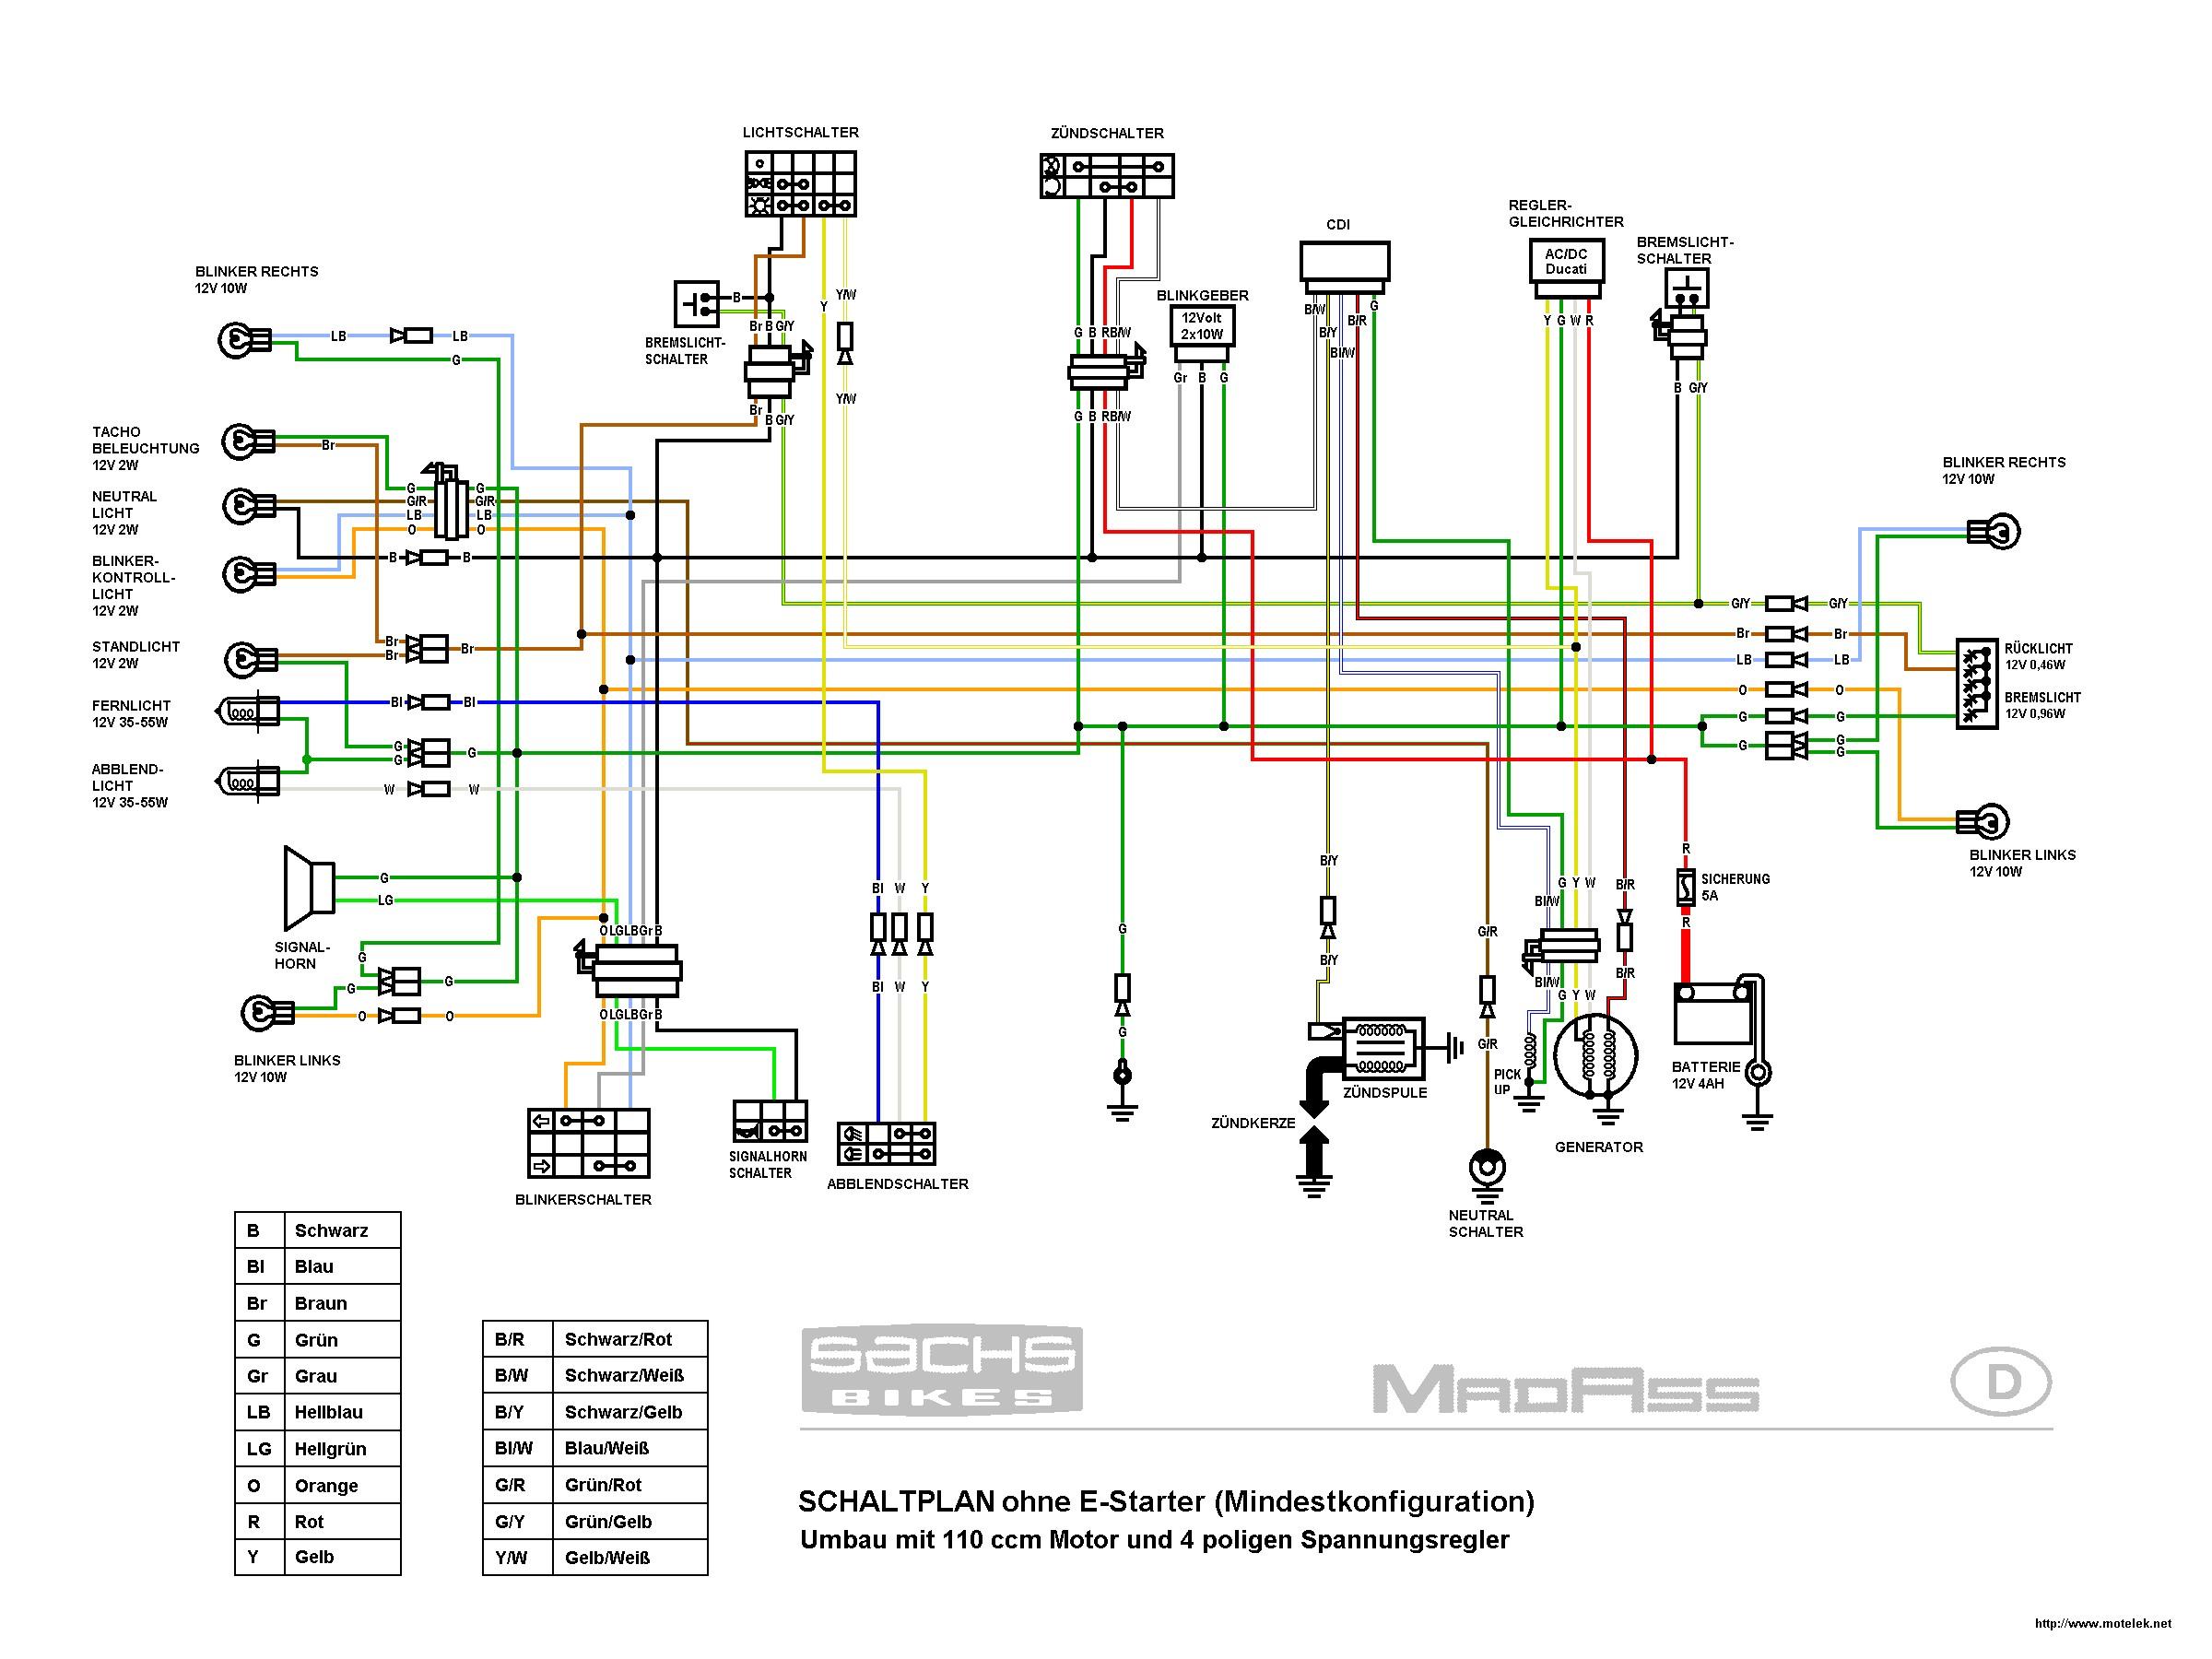 [DIAGRAM_1CA]  Wiring Diagram Honda Xrm Diagram Base Website Honda Xrm -  IMAGEVENNDIAGRAM.SPEAKEASYBARI.IT | Wiring Diagram Of Motorcycle Honda Xrm 125 |  | speakeasybari.it